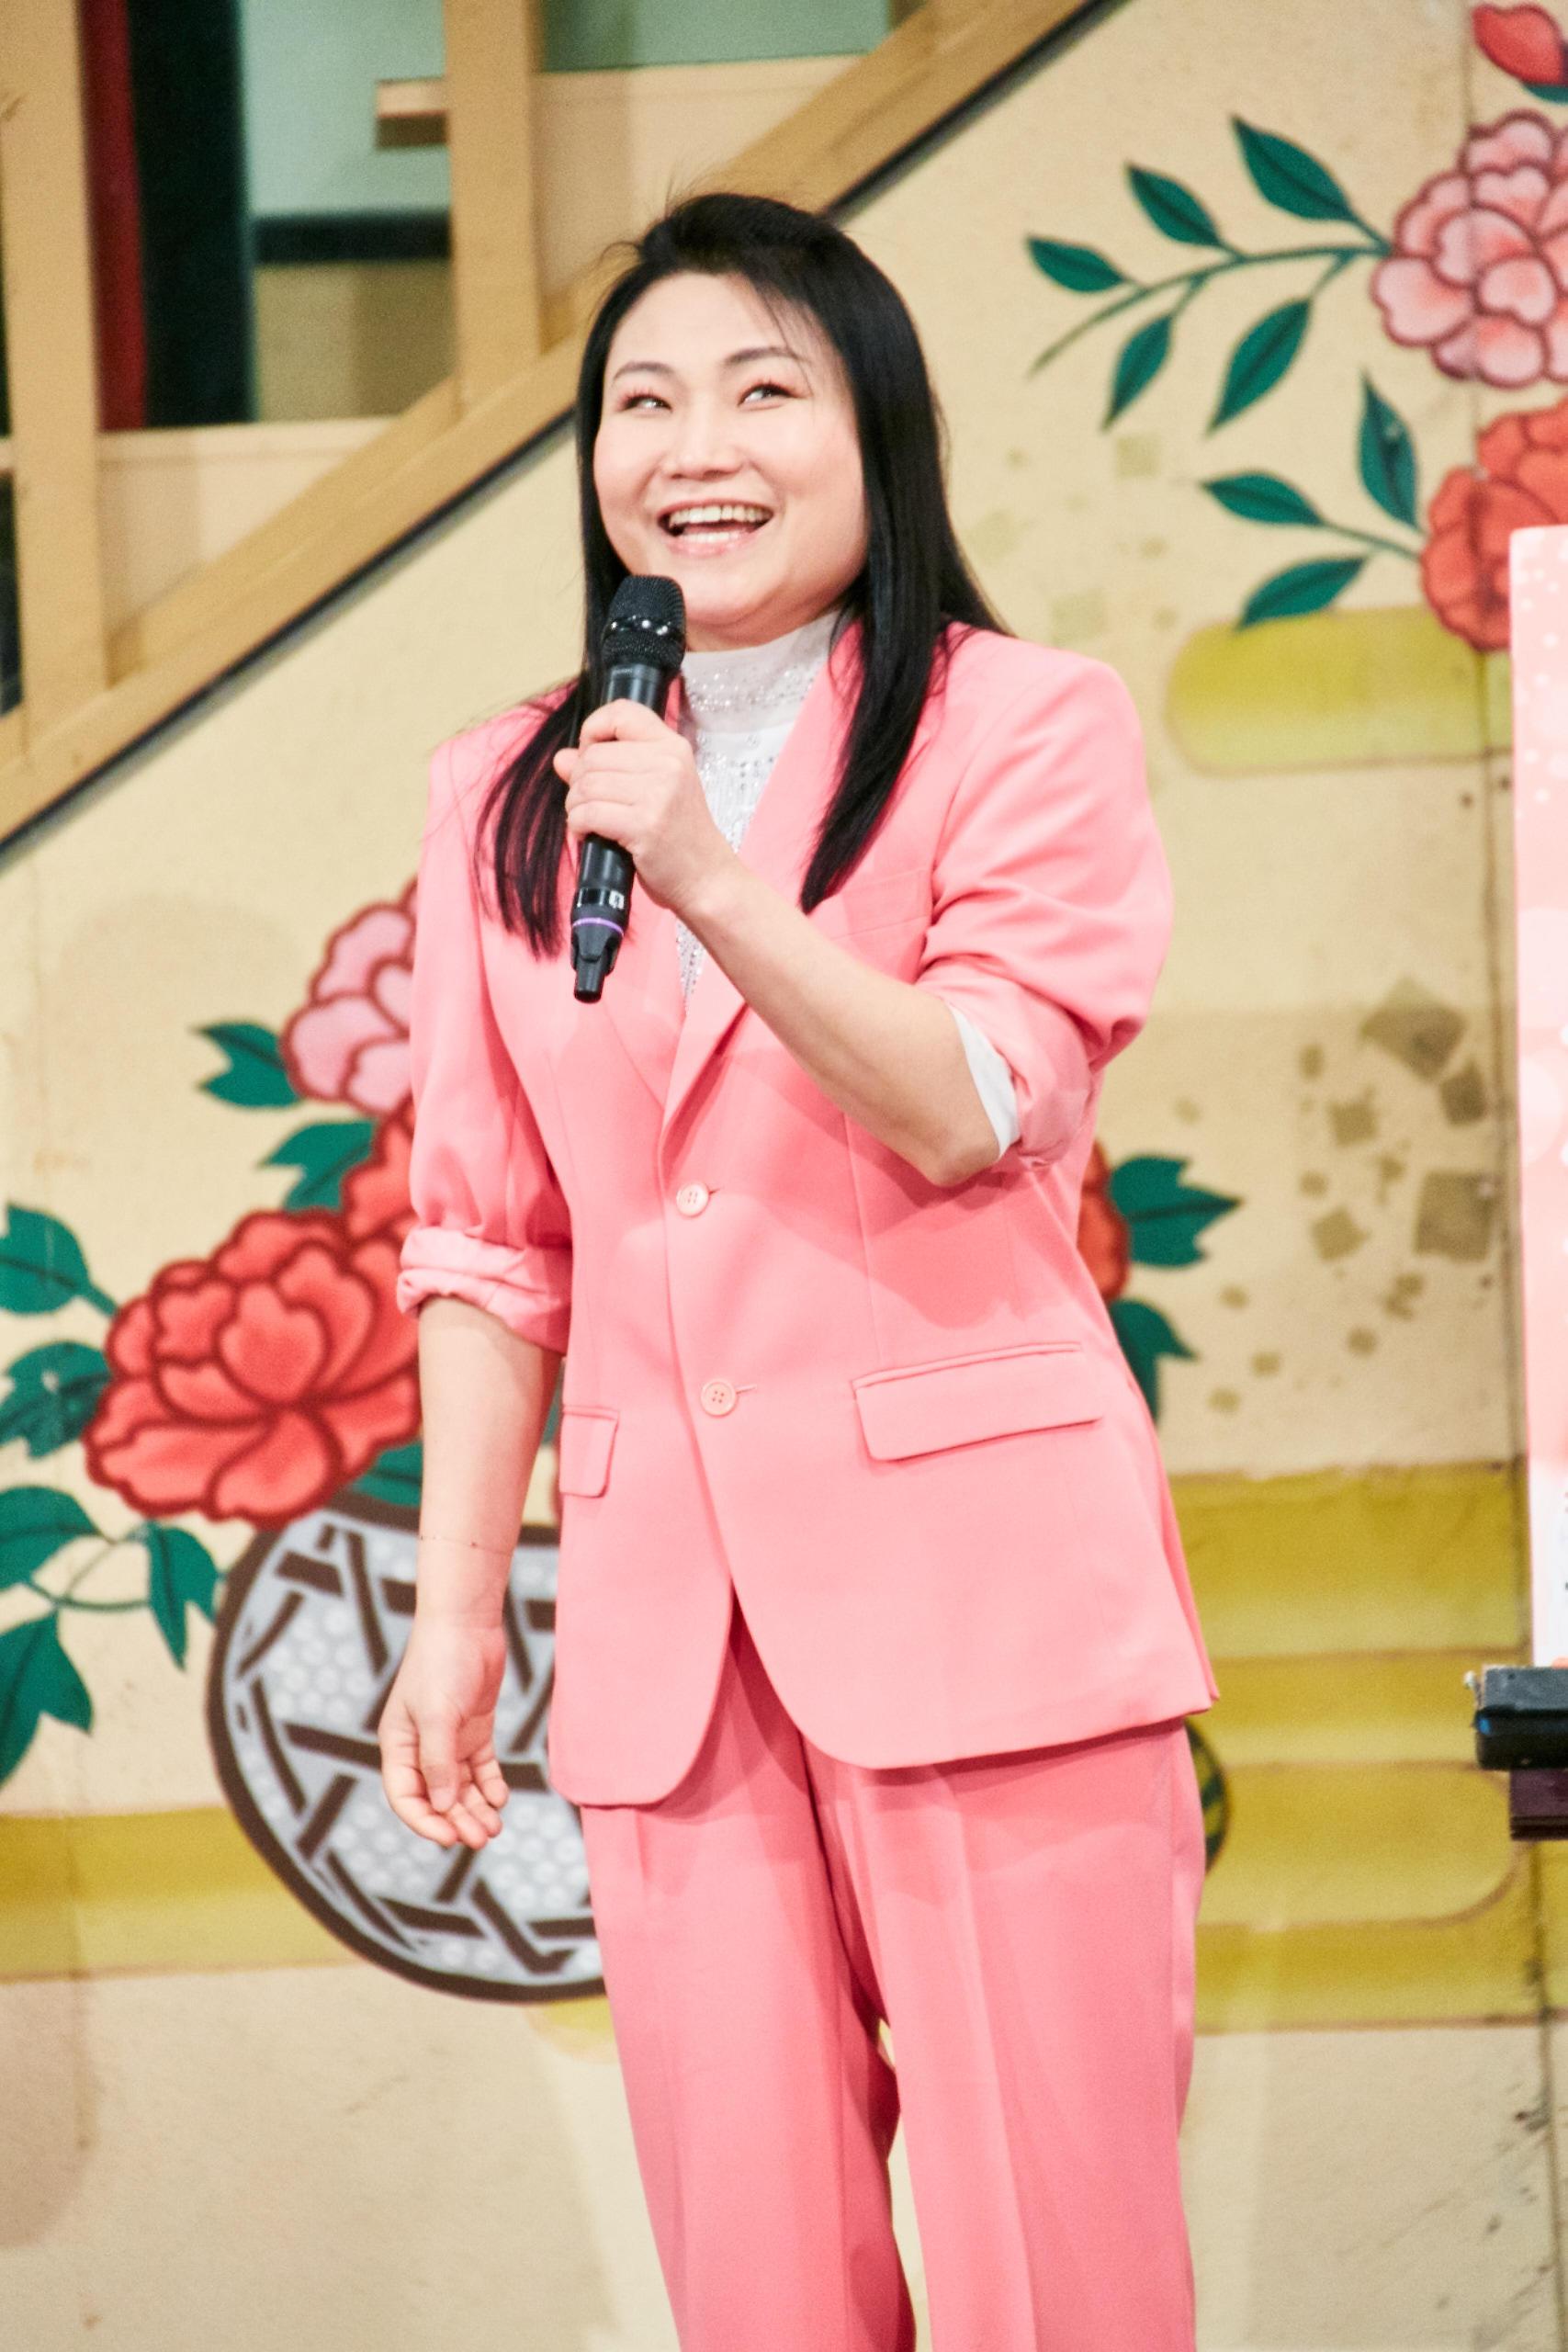 http://news.yoshimoto.co.jp/20180228003237-f817ff720737b1c208e1b08cad3411f1ea35e24f.jpg